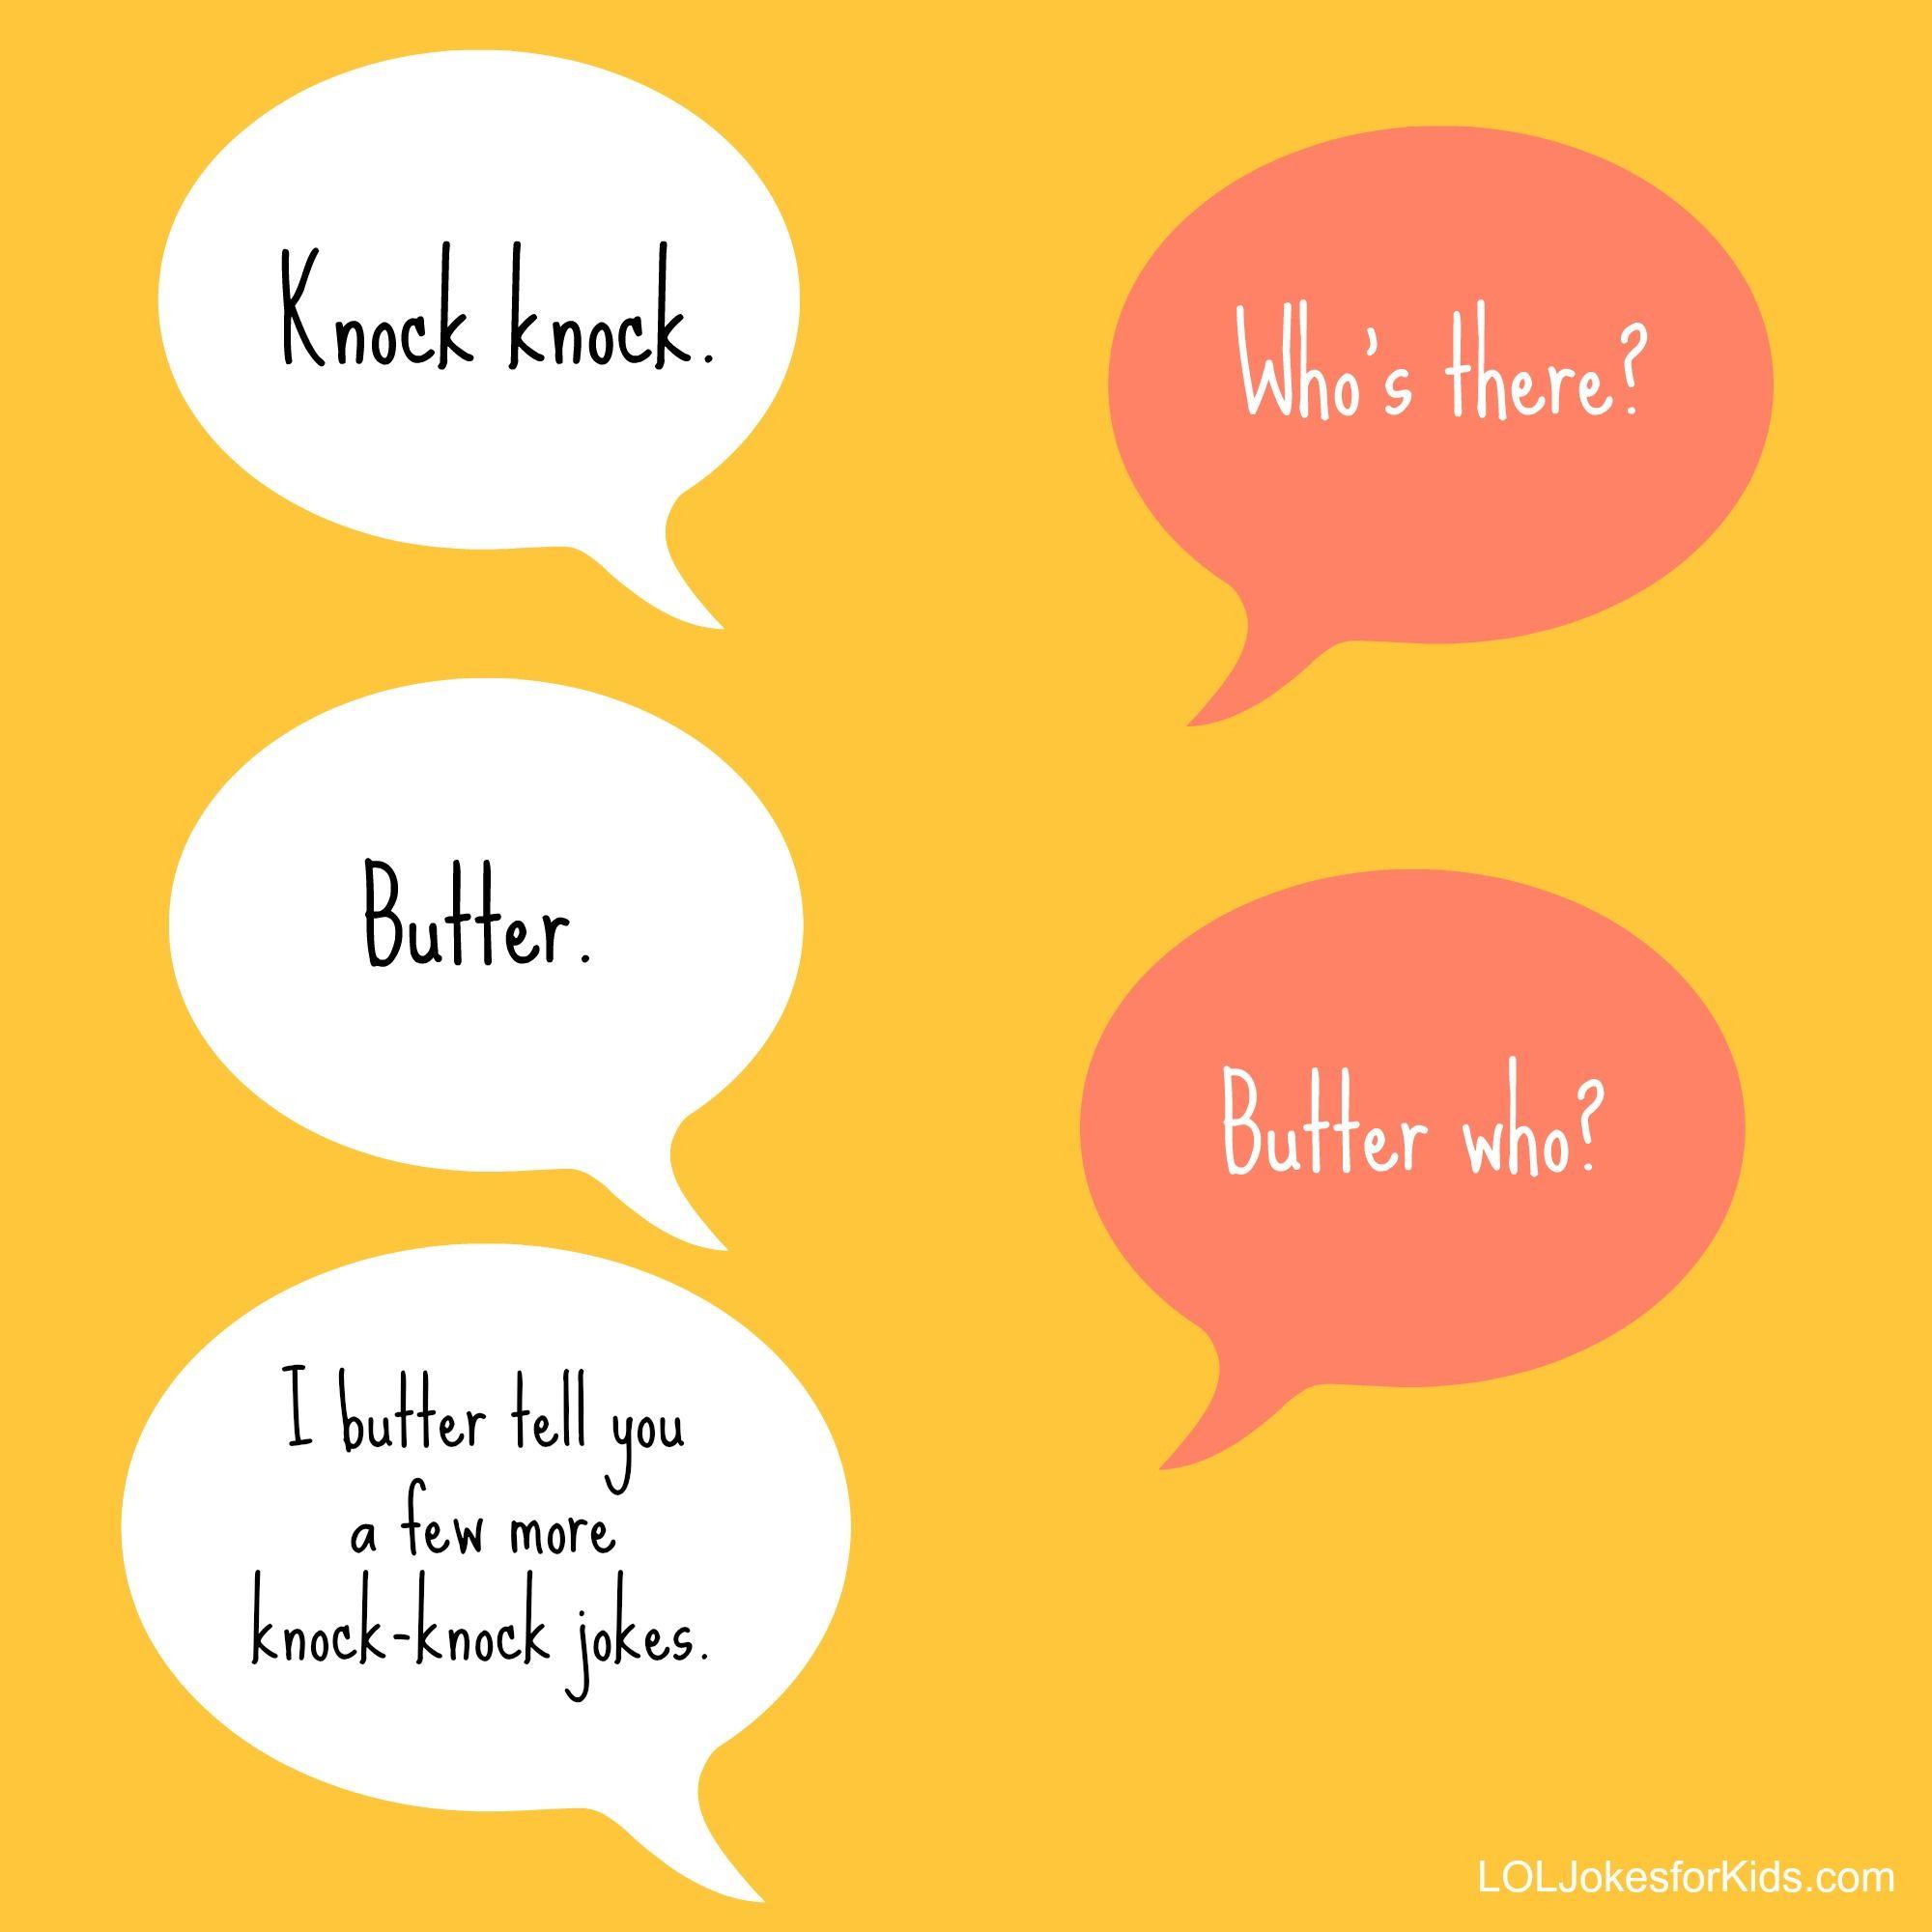 Knock knock jokes dating